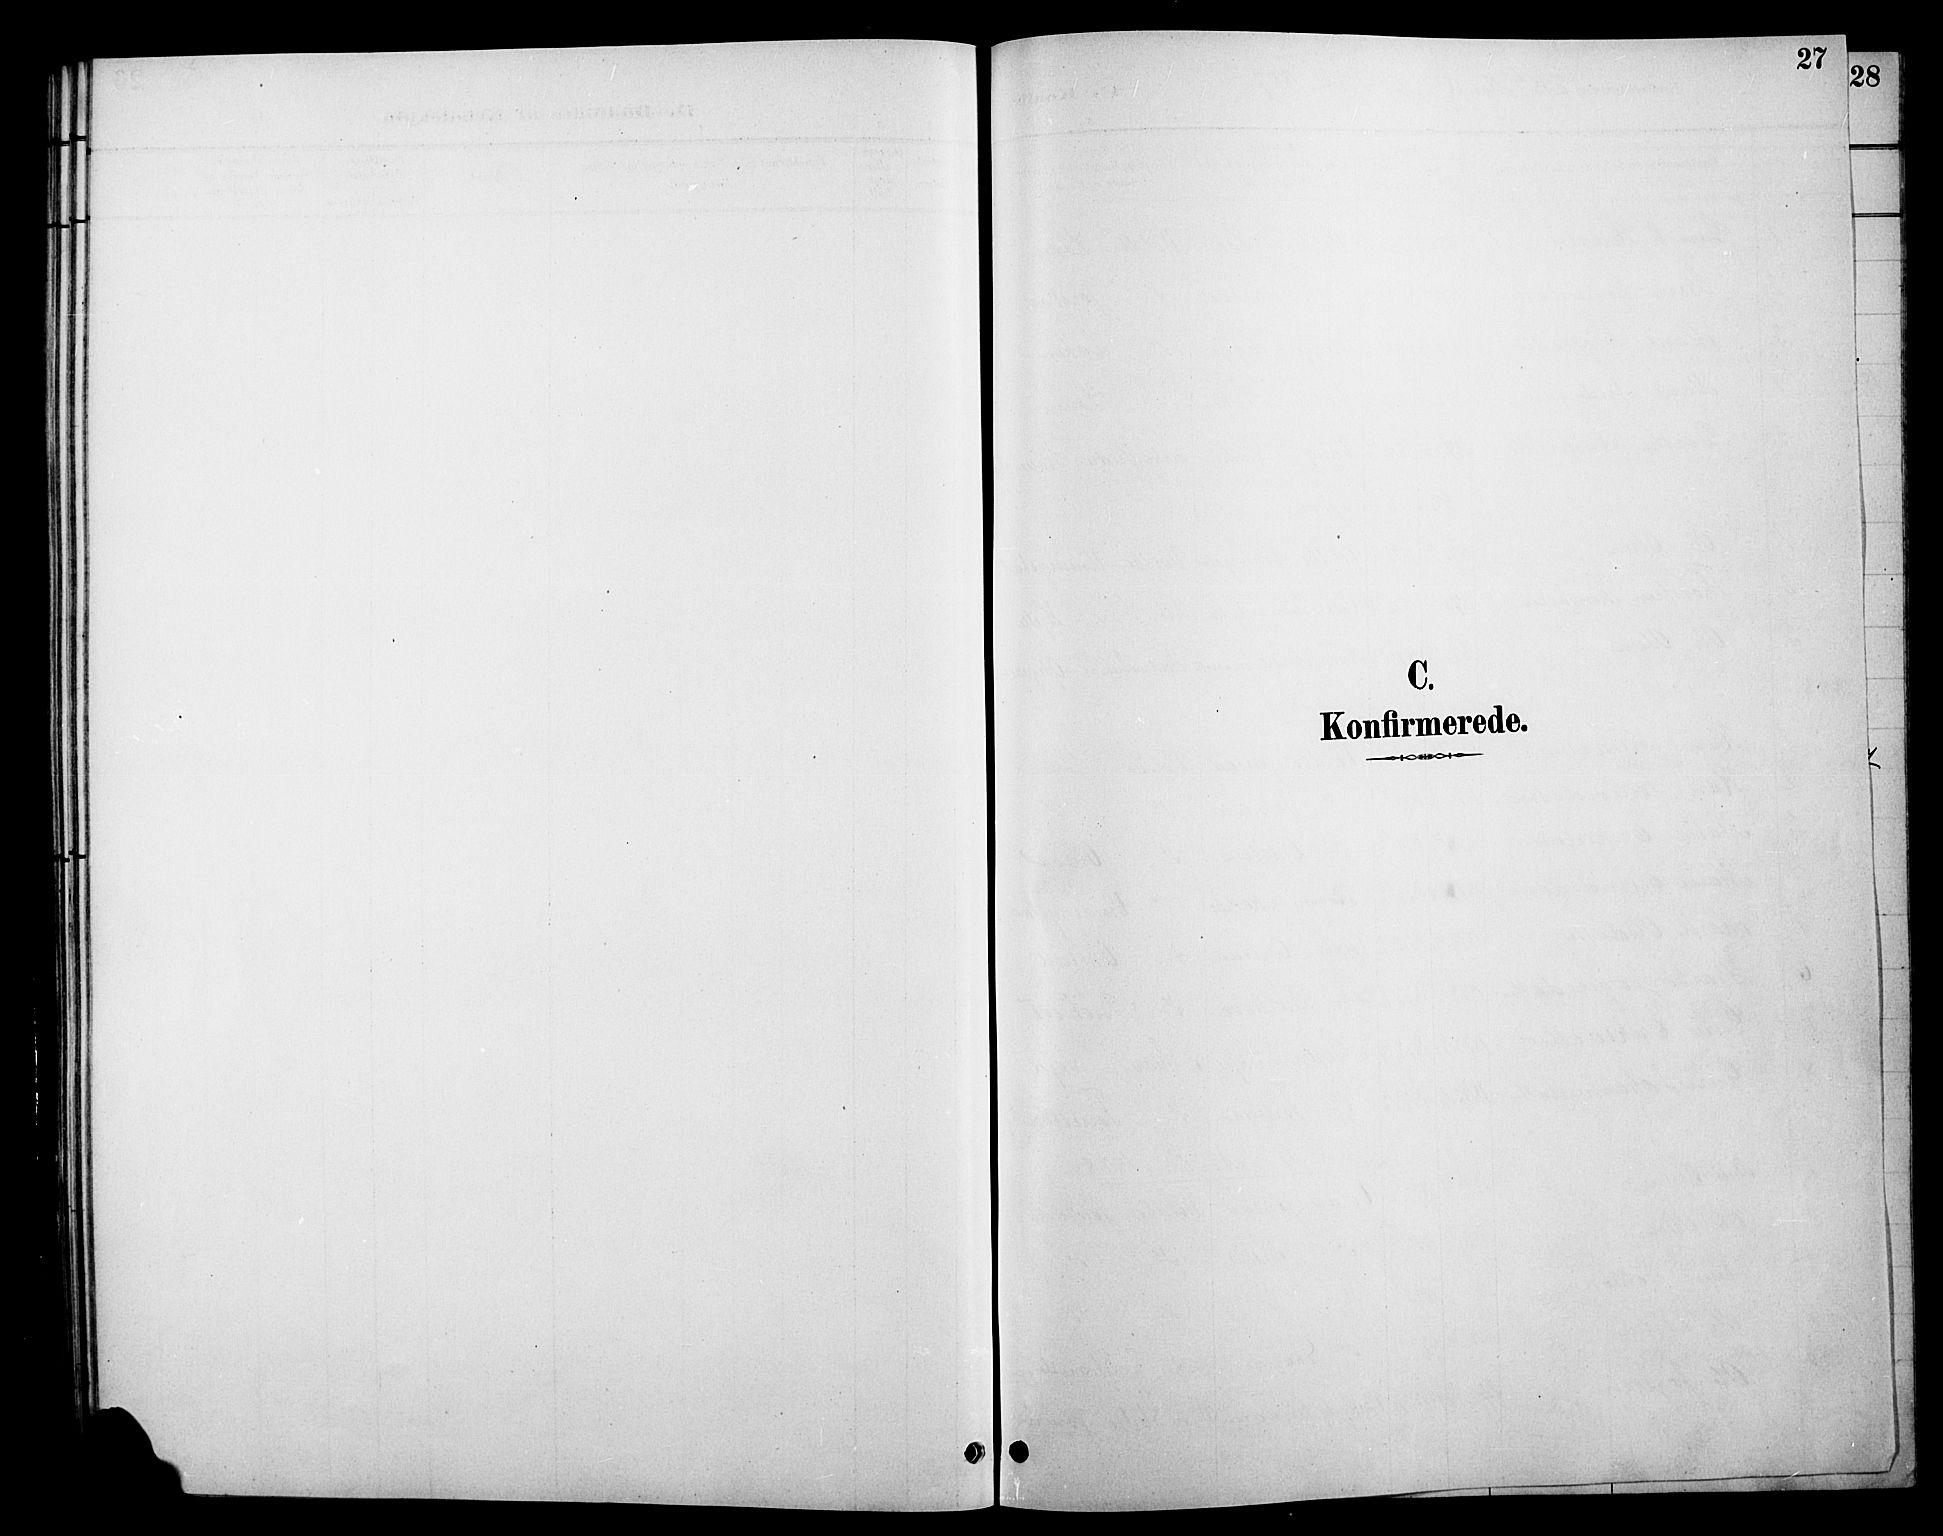 SAH, Øystre Slidre prestekontor, Klokkerbok nr. 6, 1887-1916, s. 27